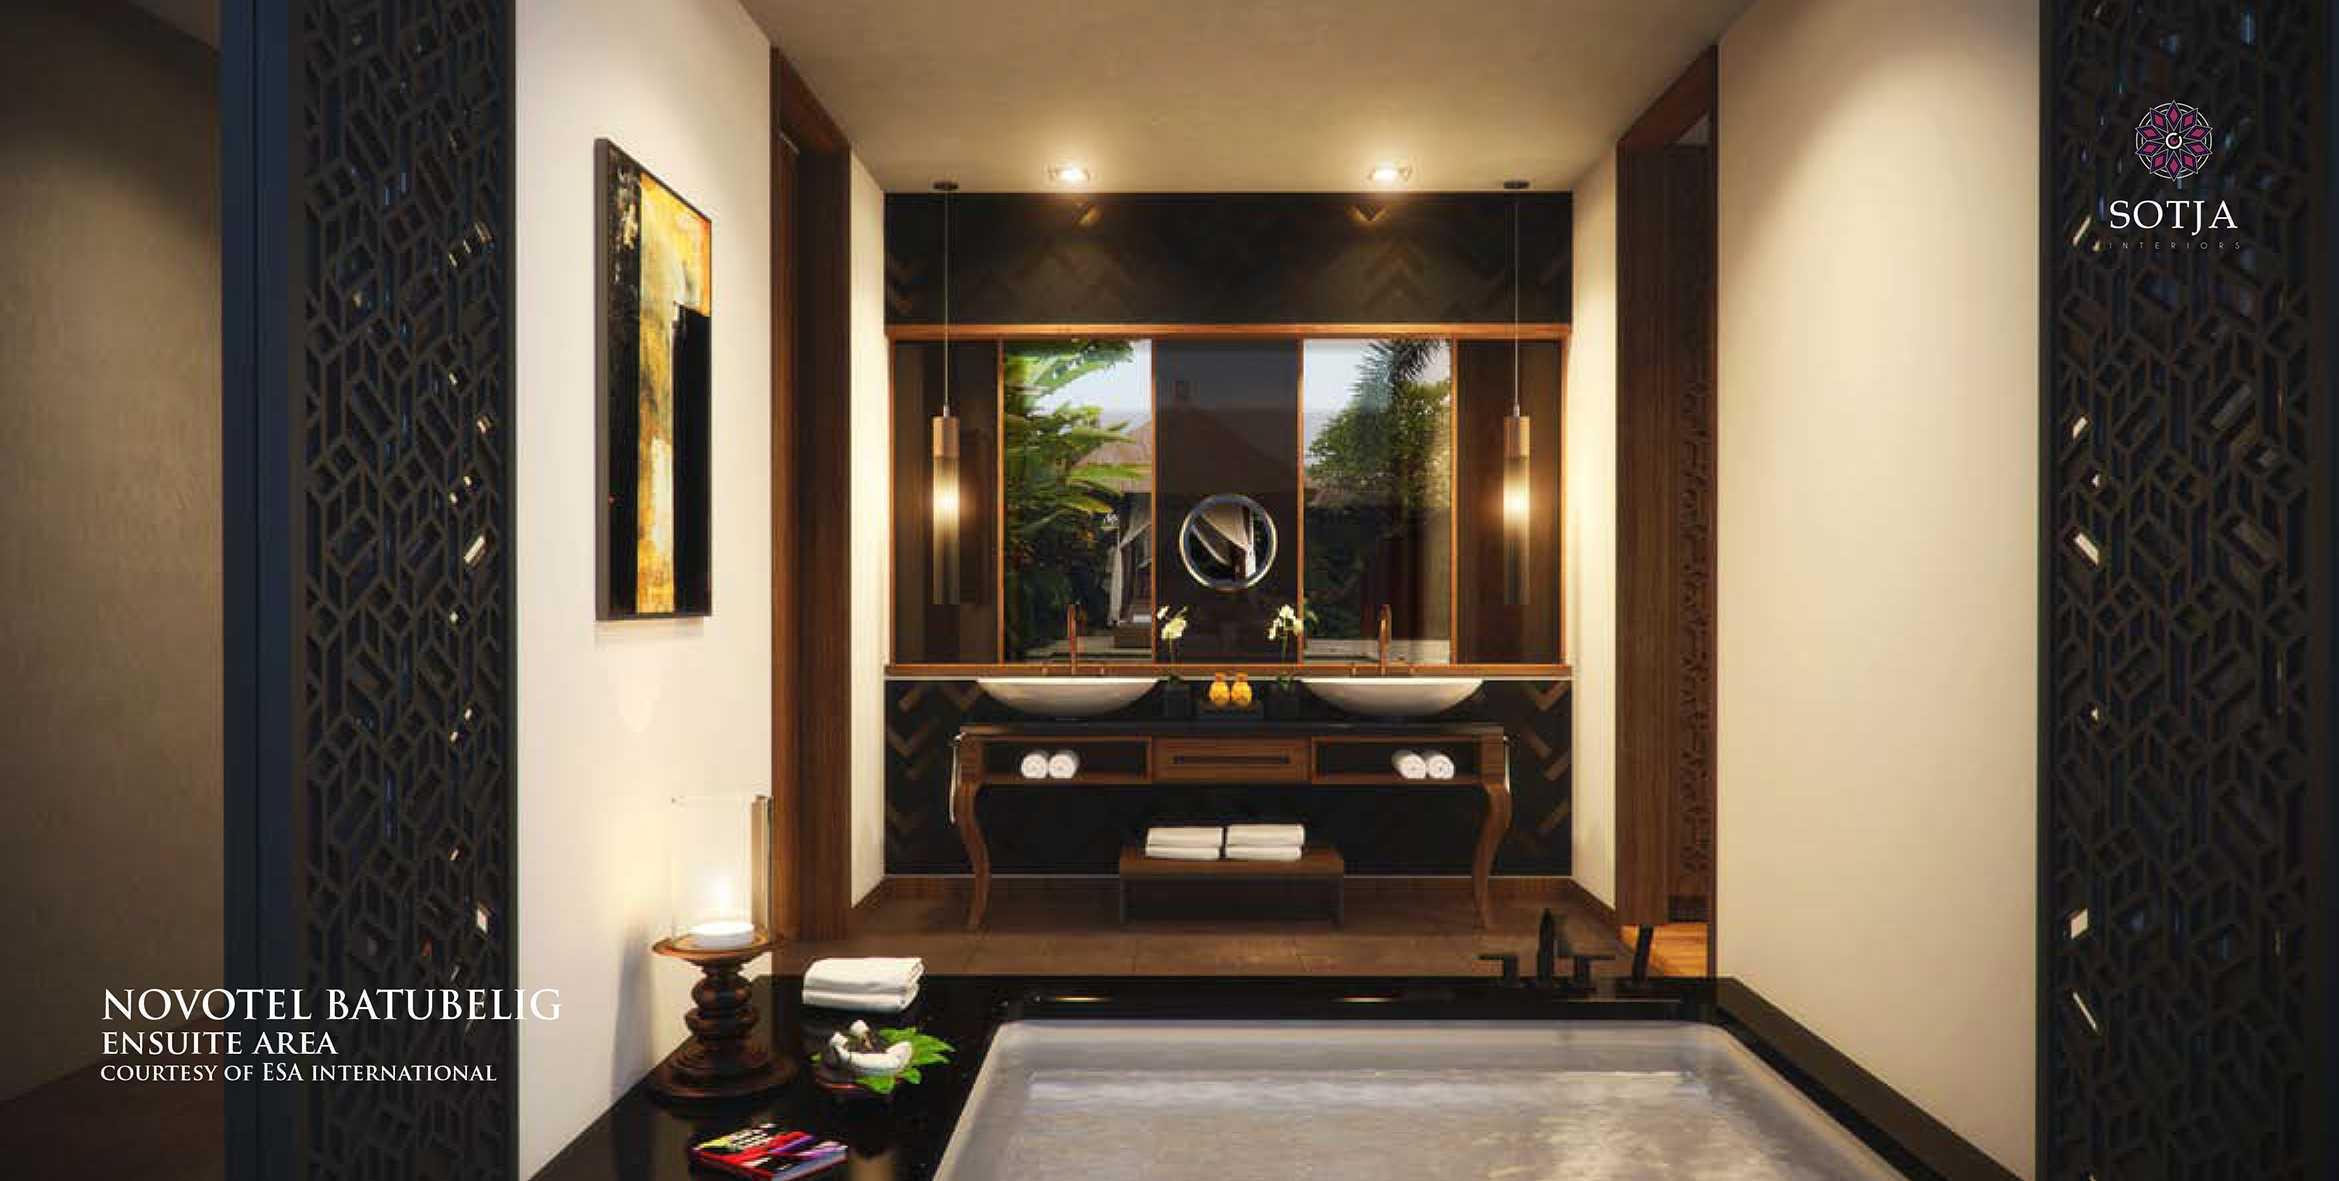 Sotja Interiors Novotel At Batu Belig Bali, Indonesia Bali, Indonesia Ensuite-Area Kontemporer  9947